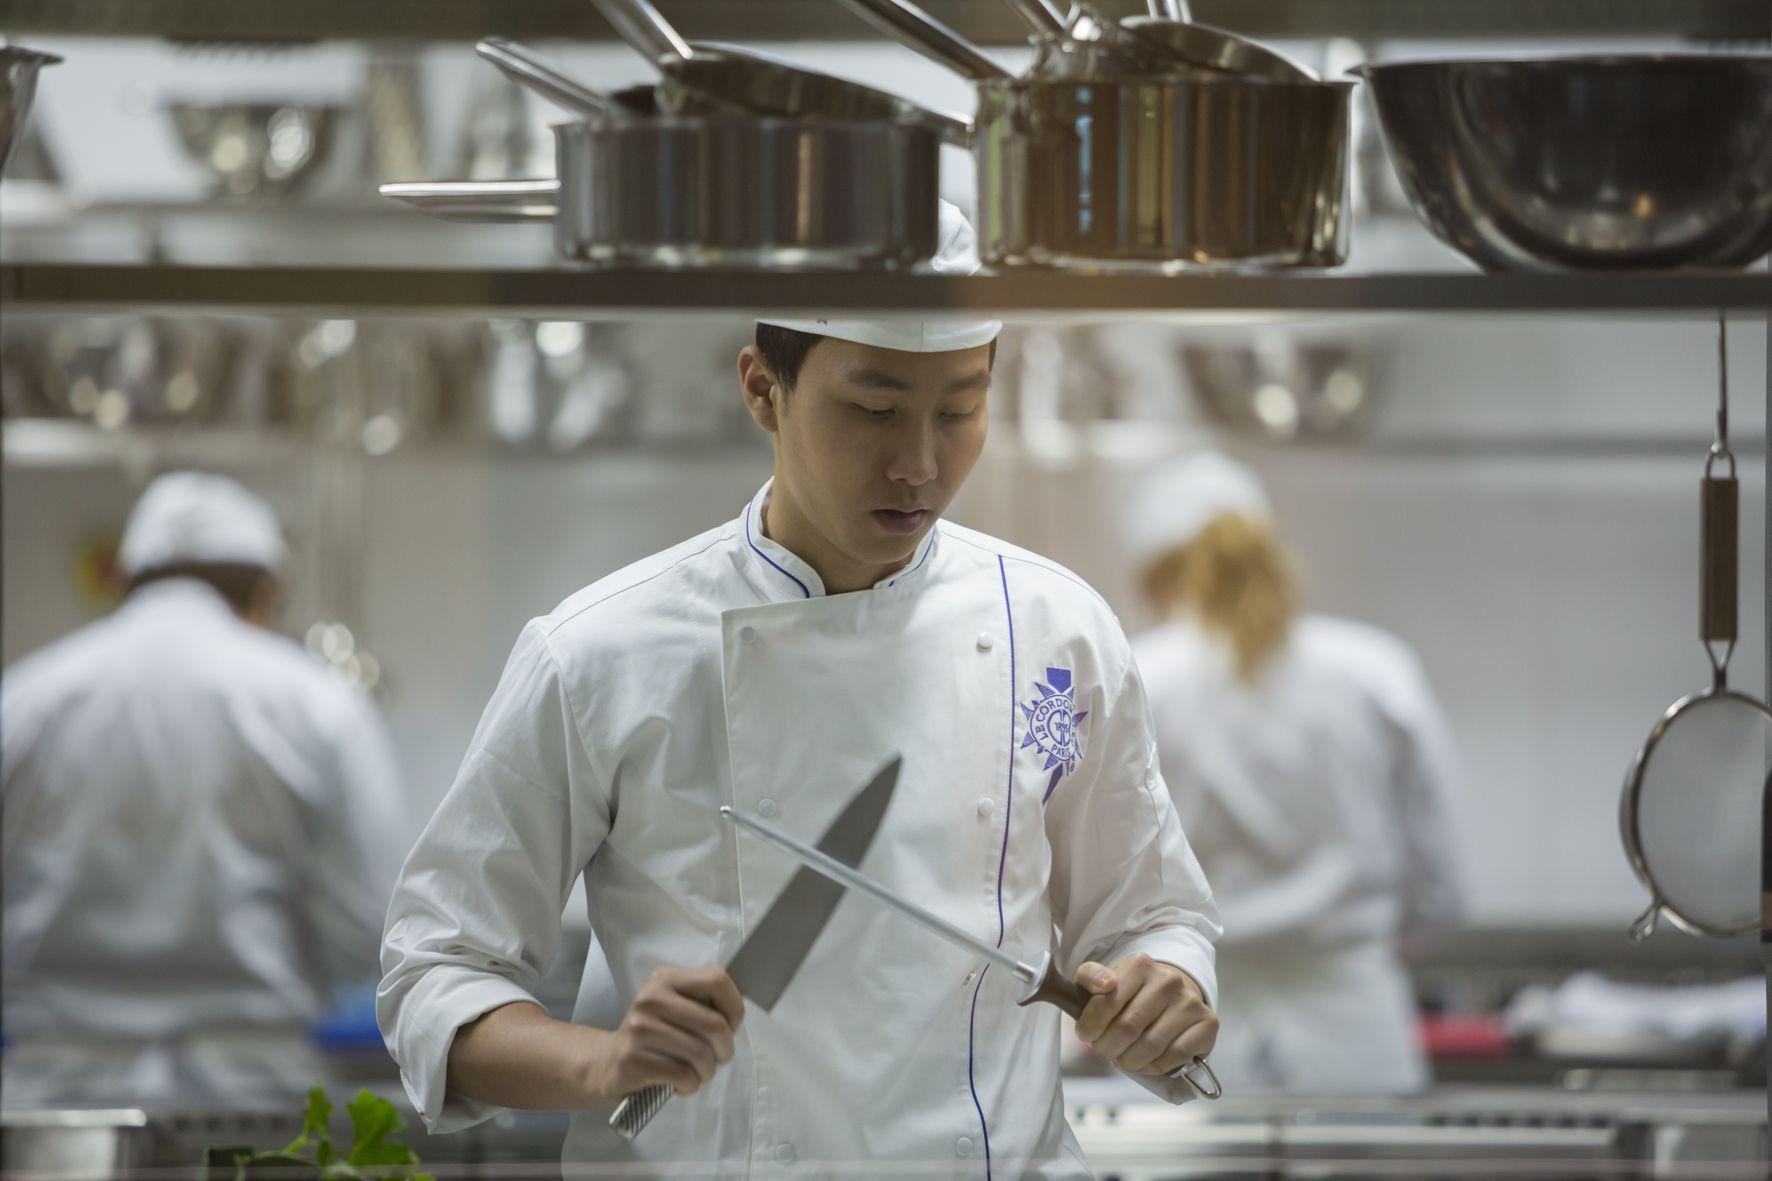 Le Grand Diplôme   Culinary arts. Cordon bleu. Le cordon bleu